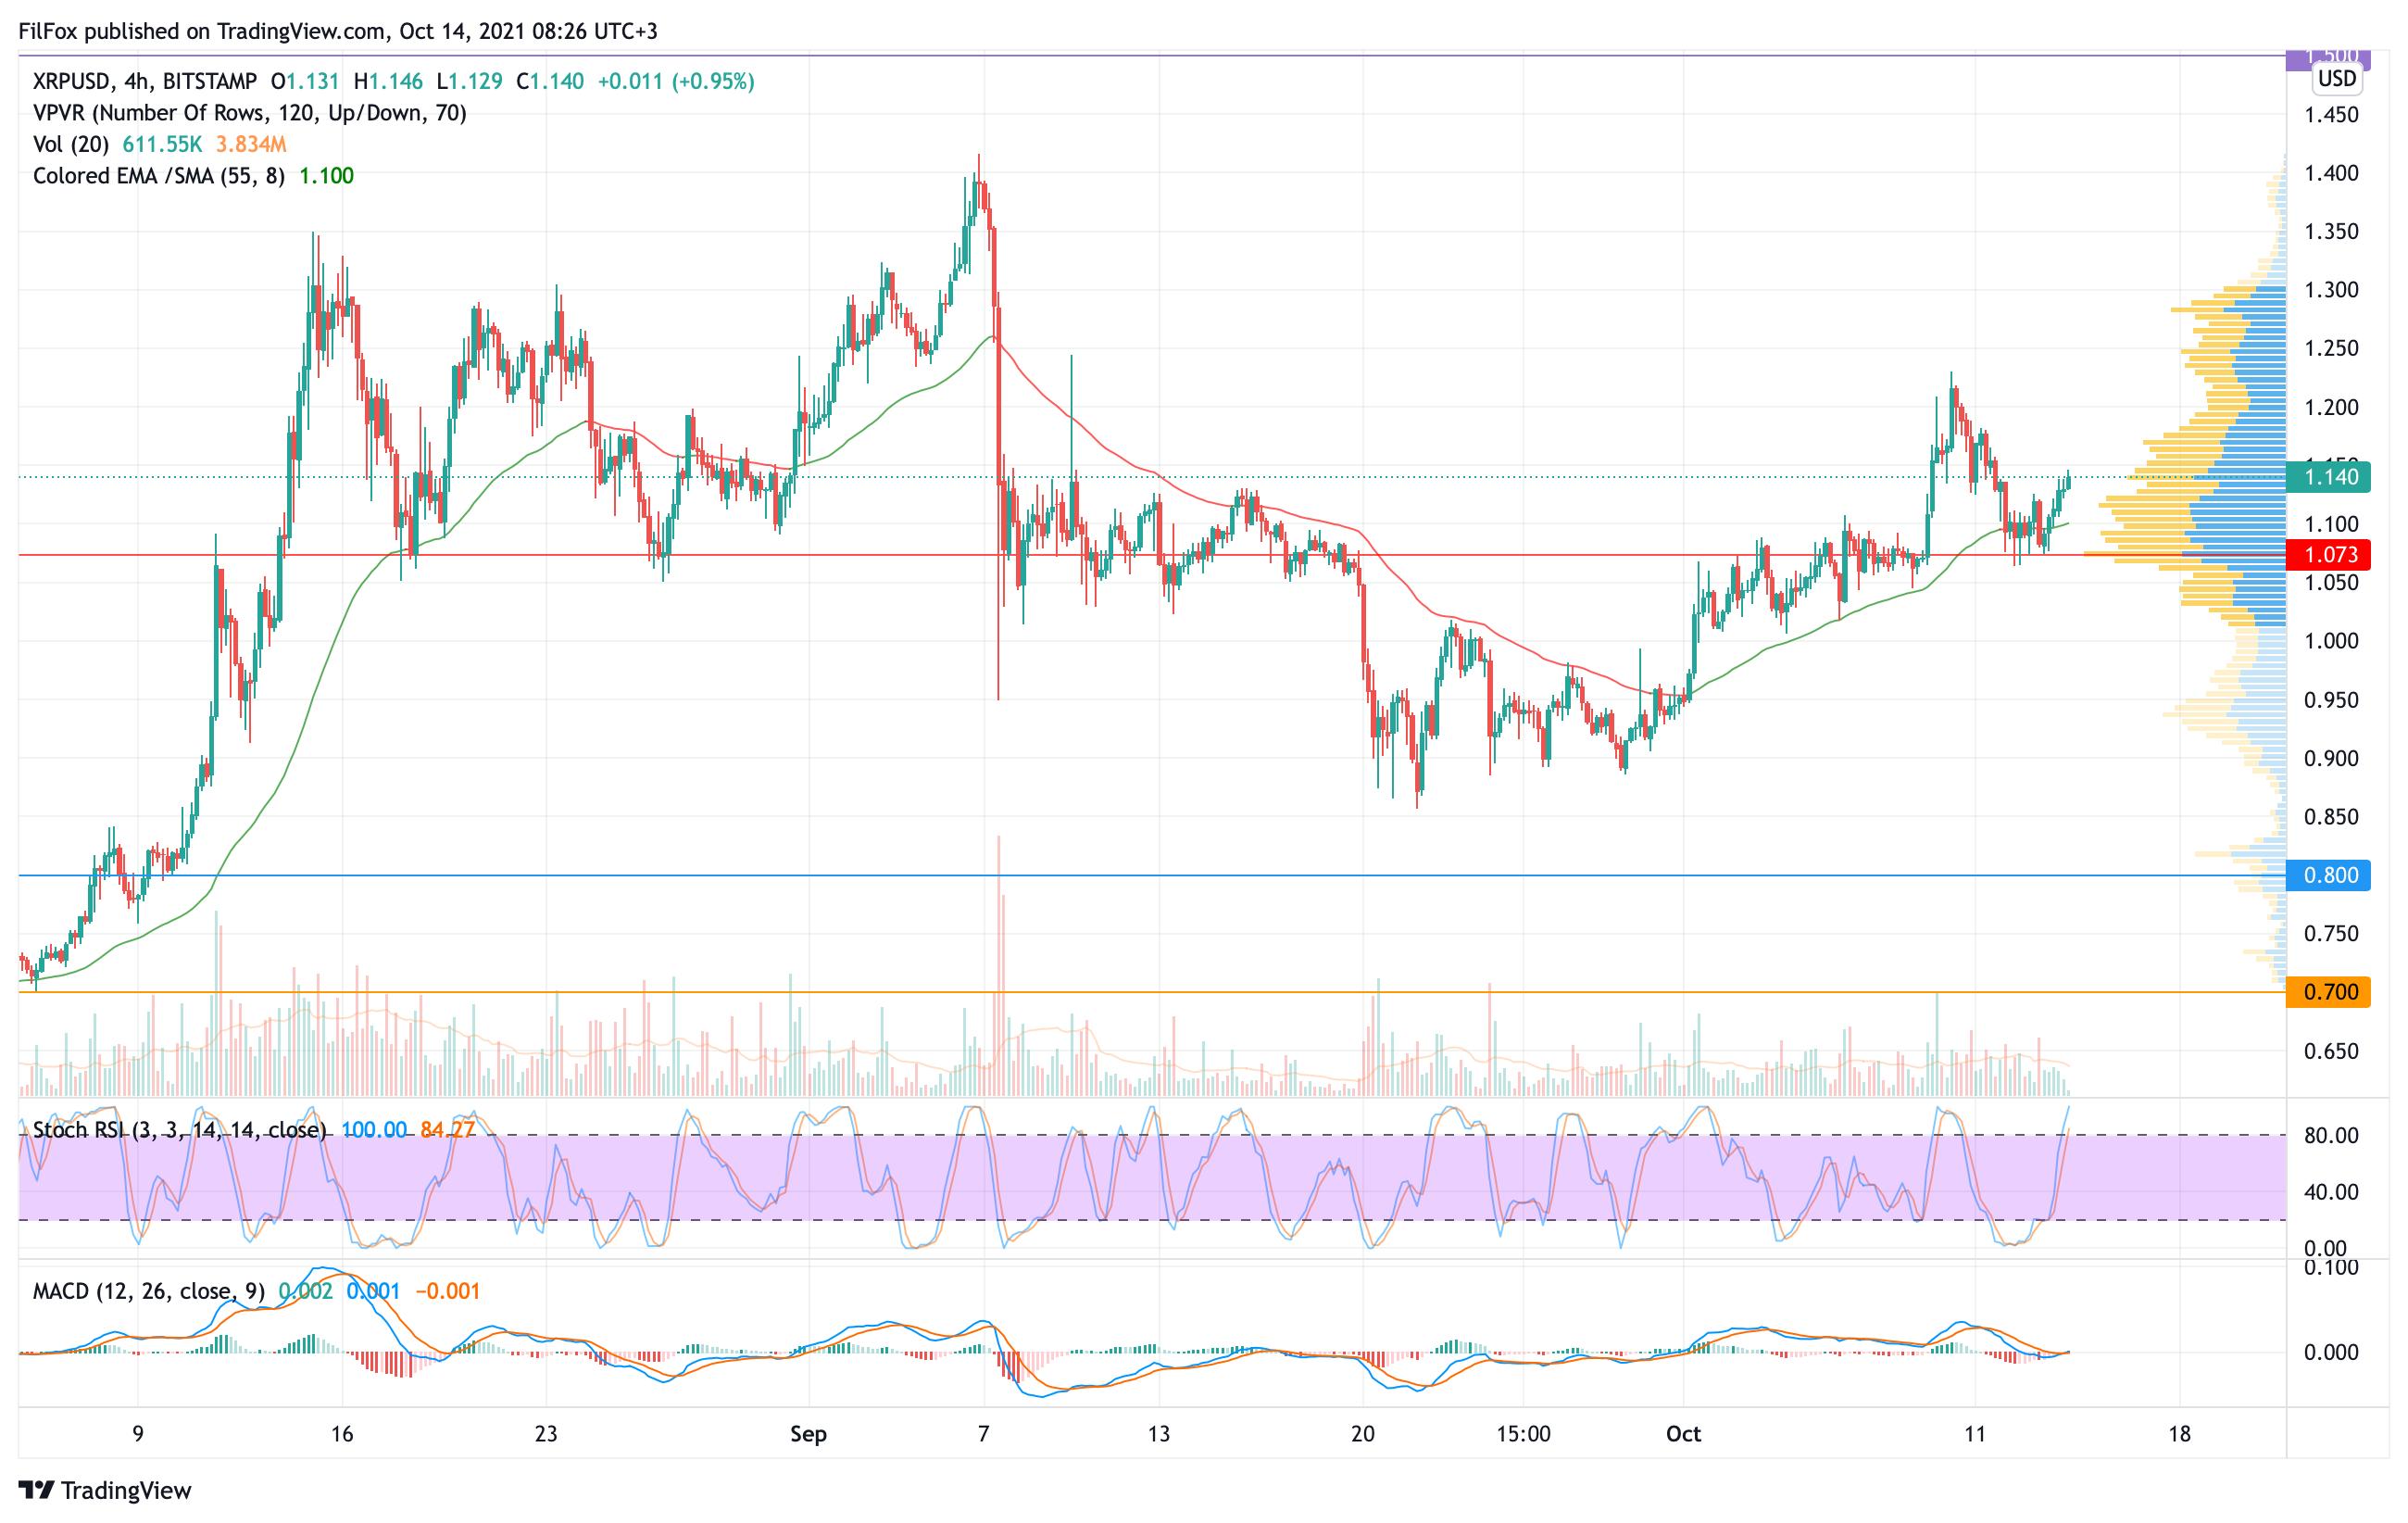 Анализ цен Bitcoin, Ethereum, XRP на 14.10.2021